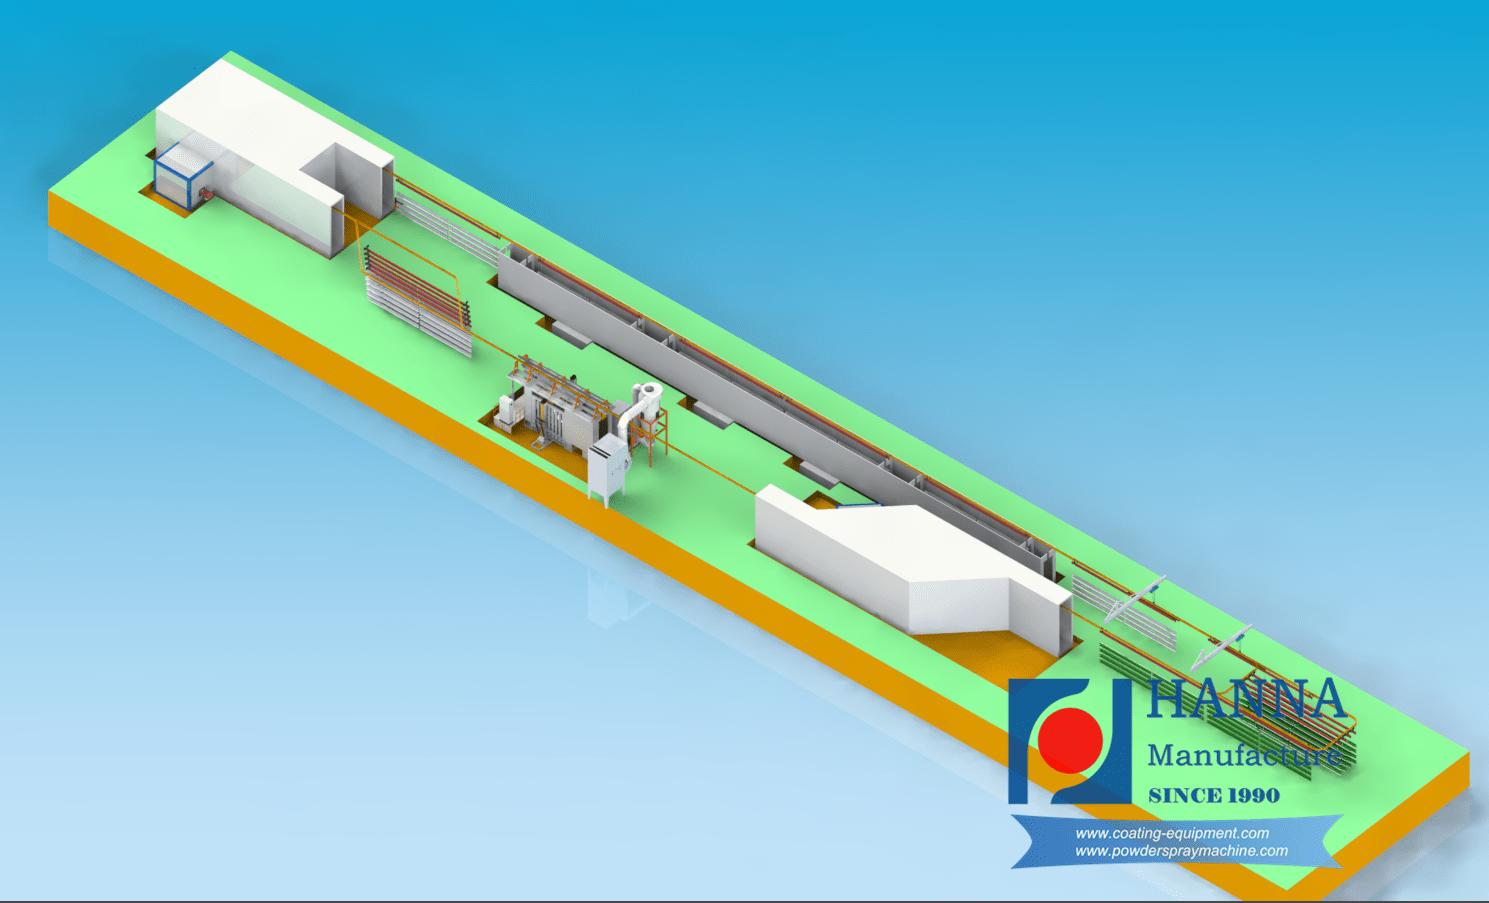 Power And Free Overhead Conveyor Line